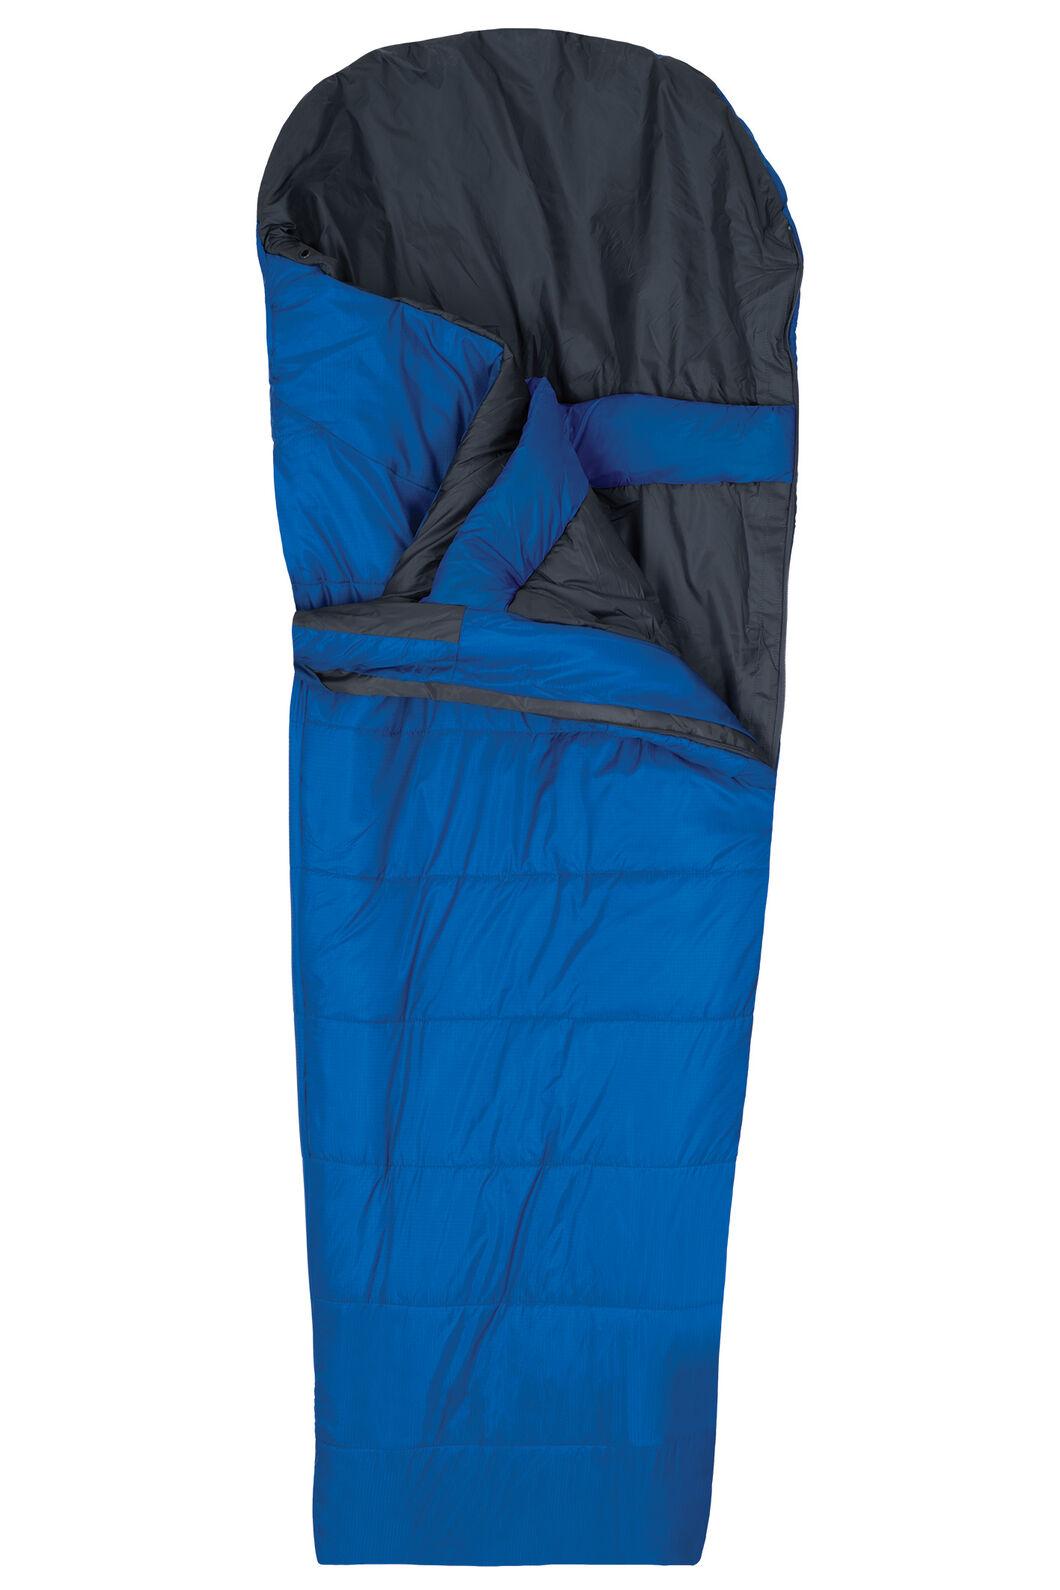 Macpac Roam Synthetic 350 Sleeping Bag - Extra Large 28b4e7d425205